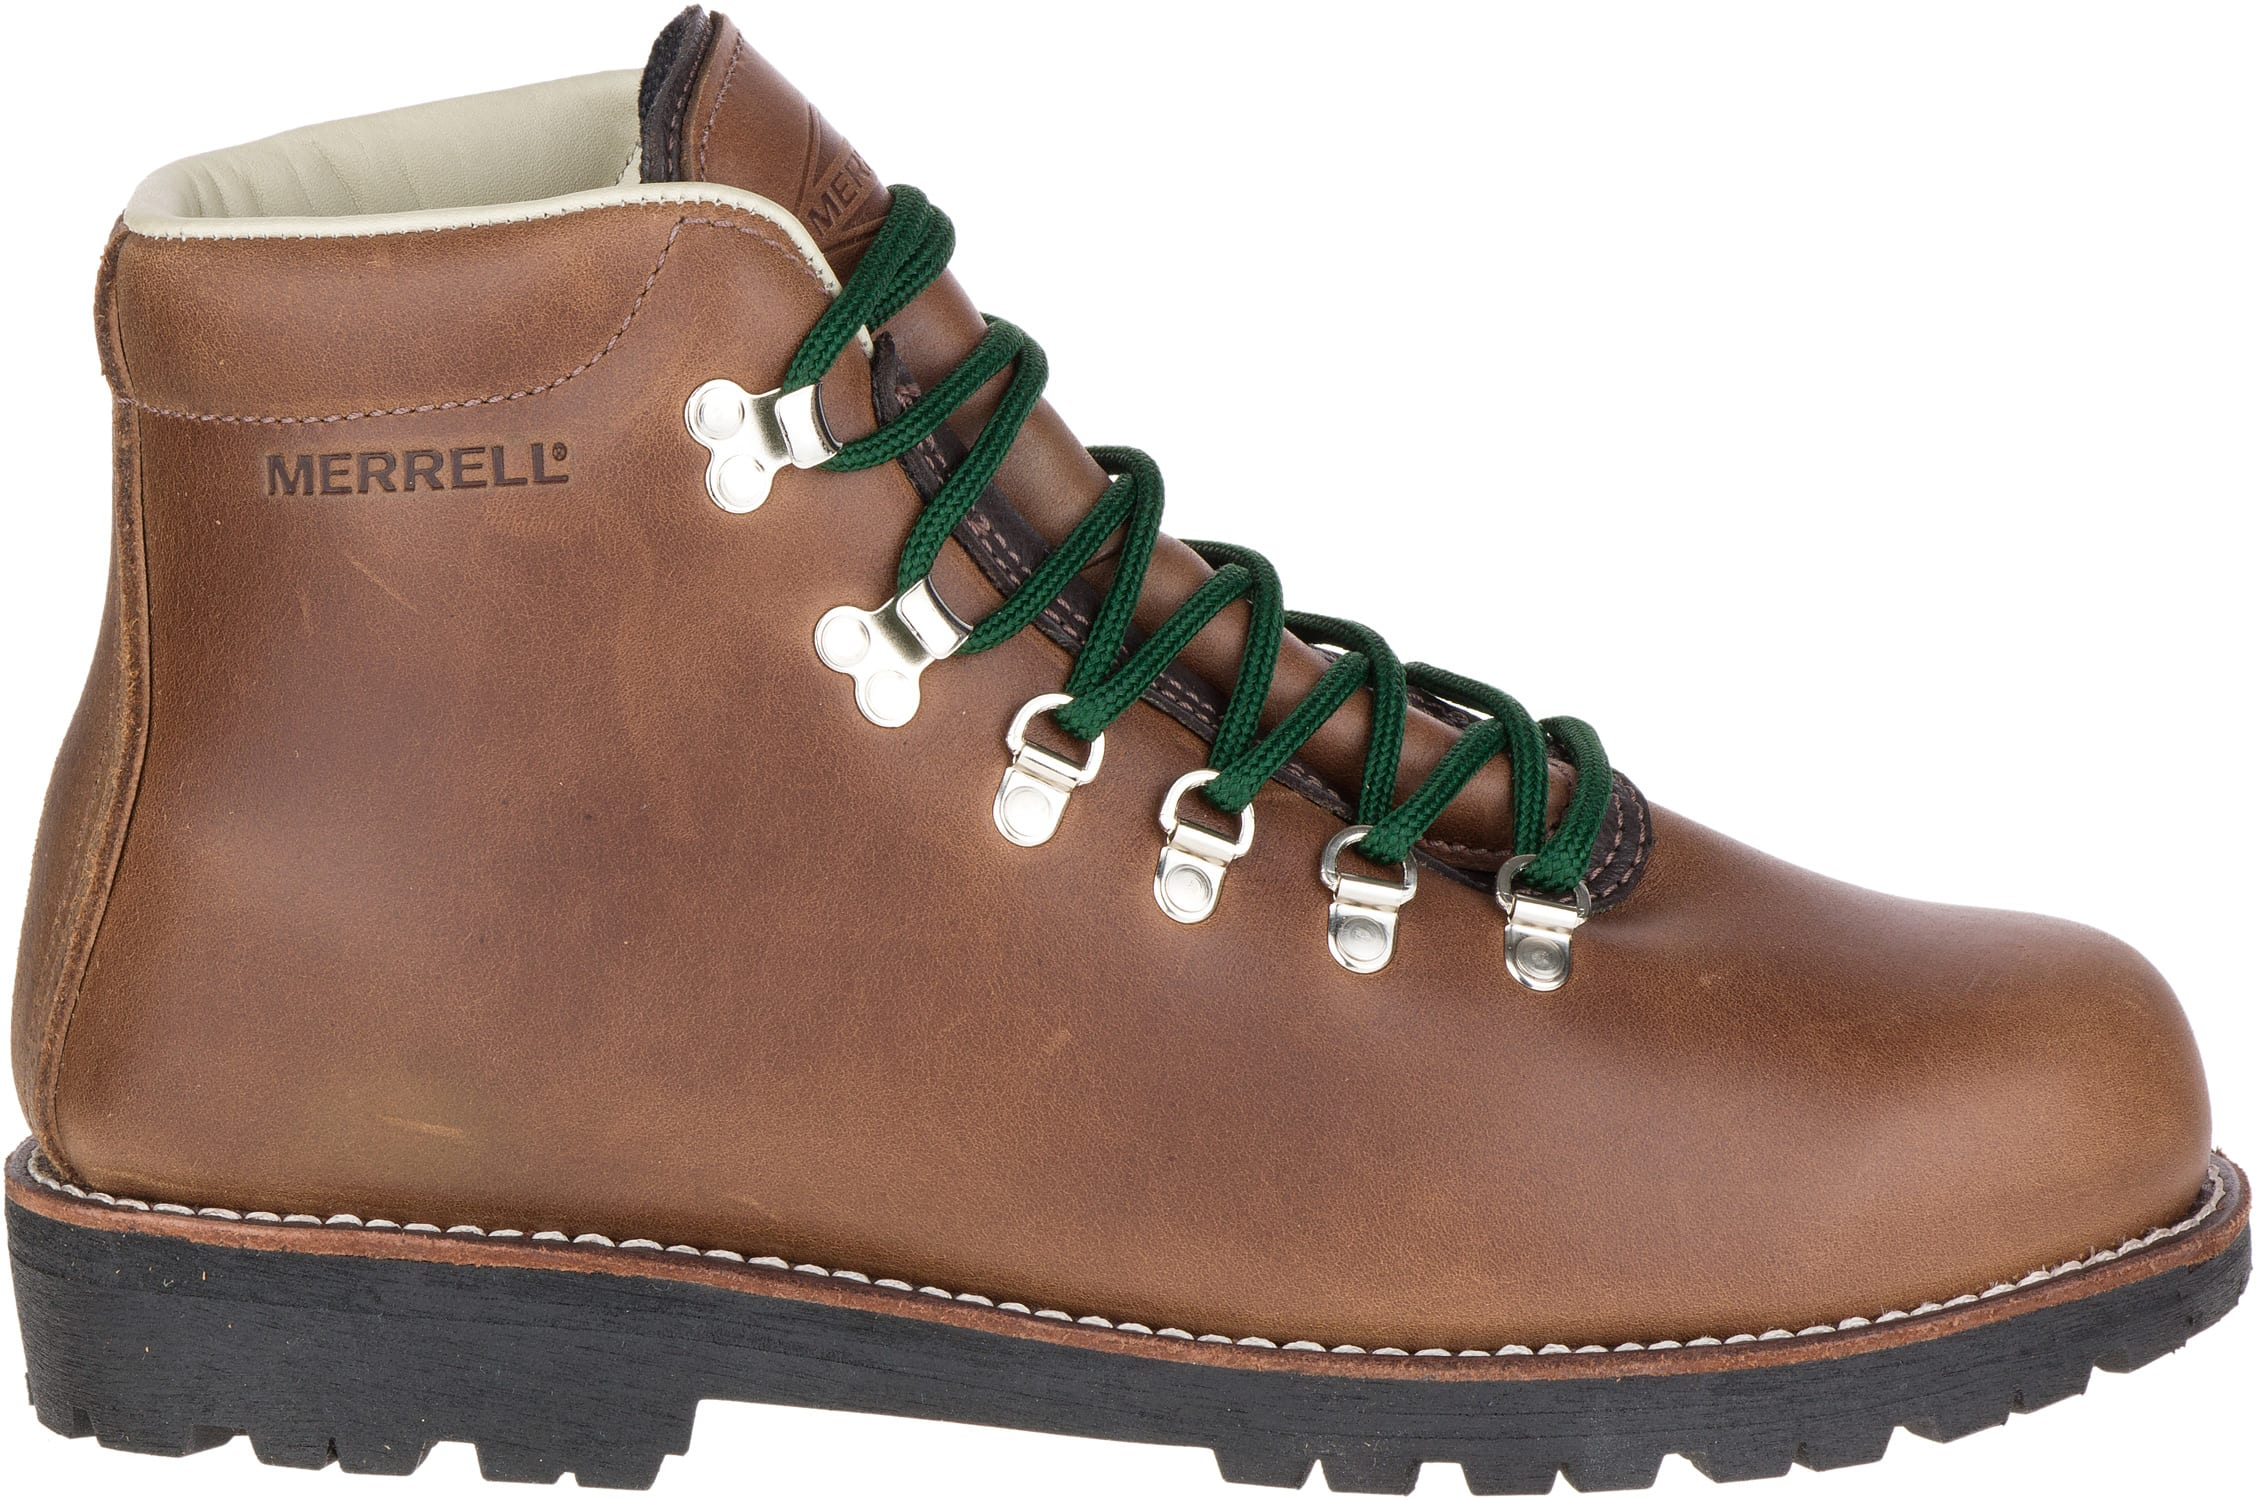 Merrell Wilderness Usa Hiking Shoes